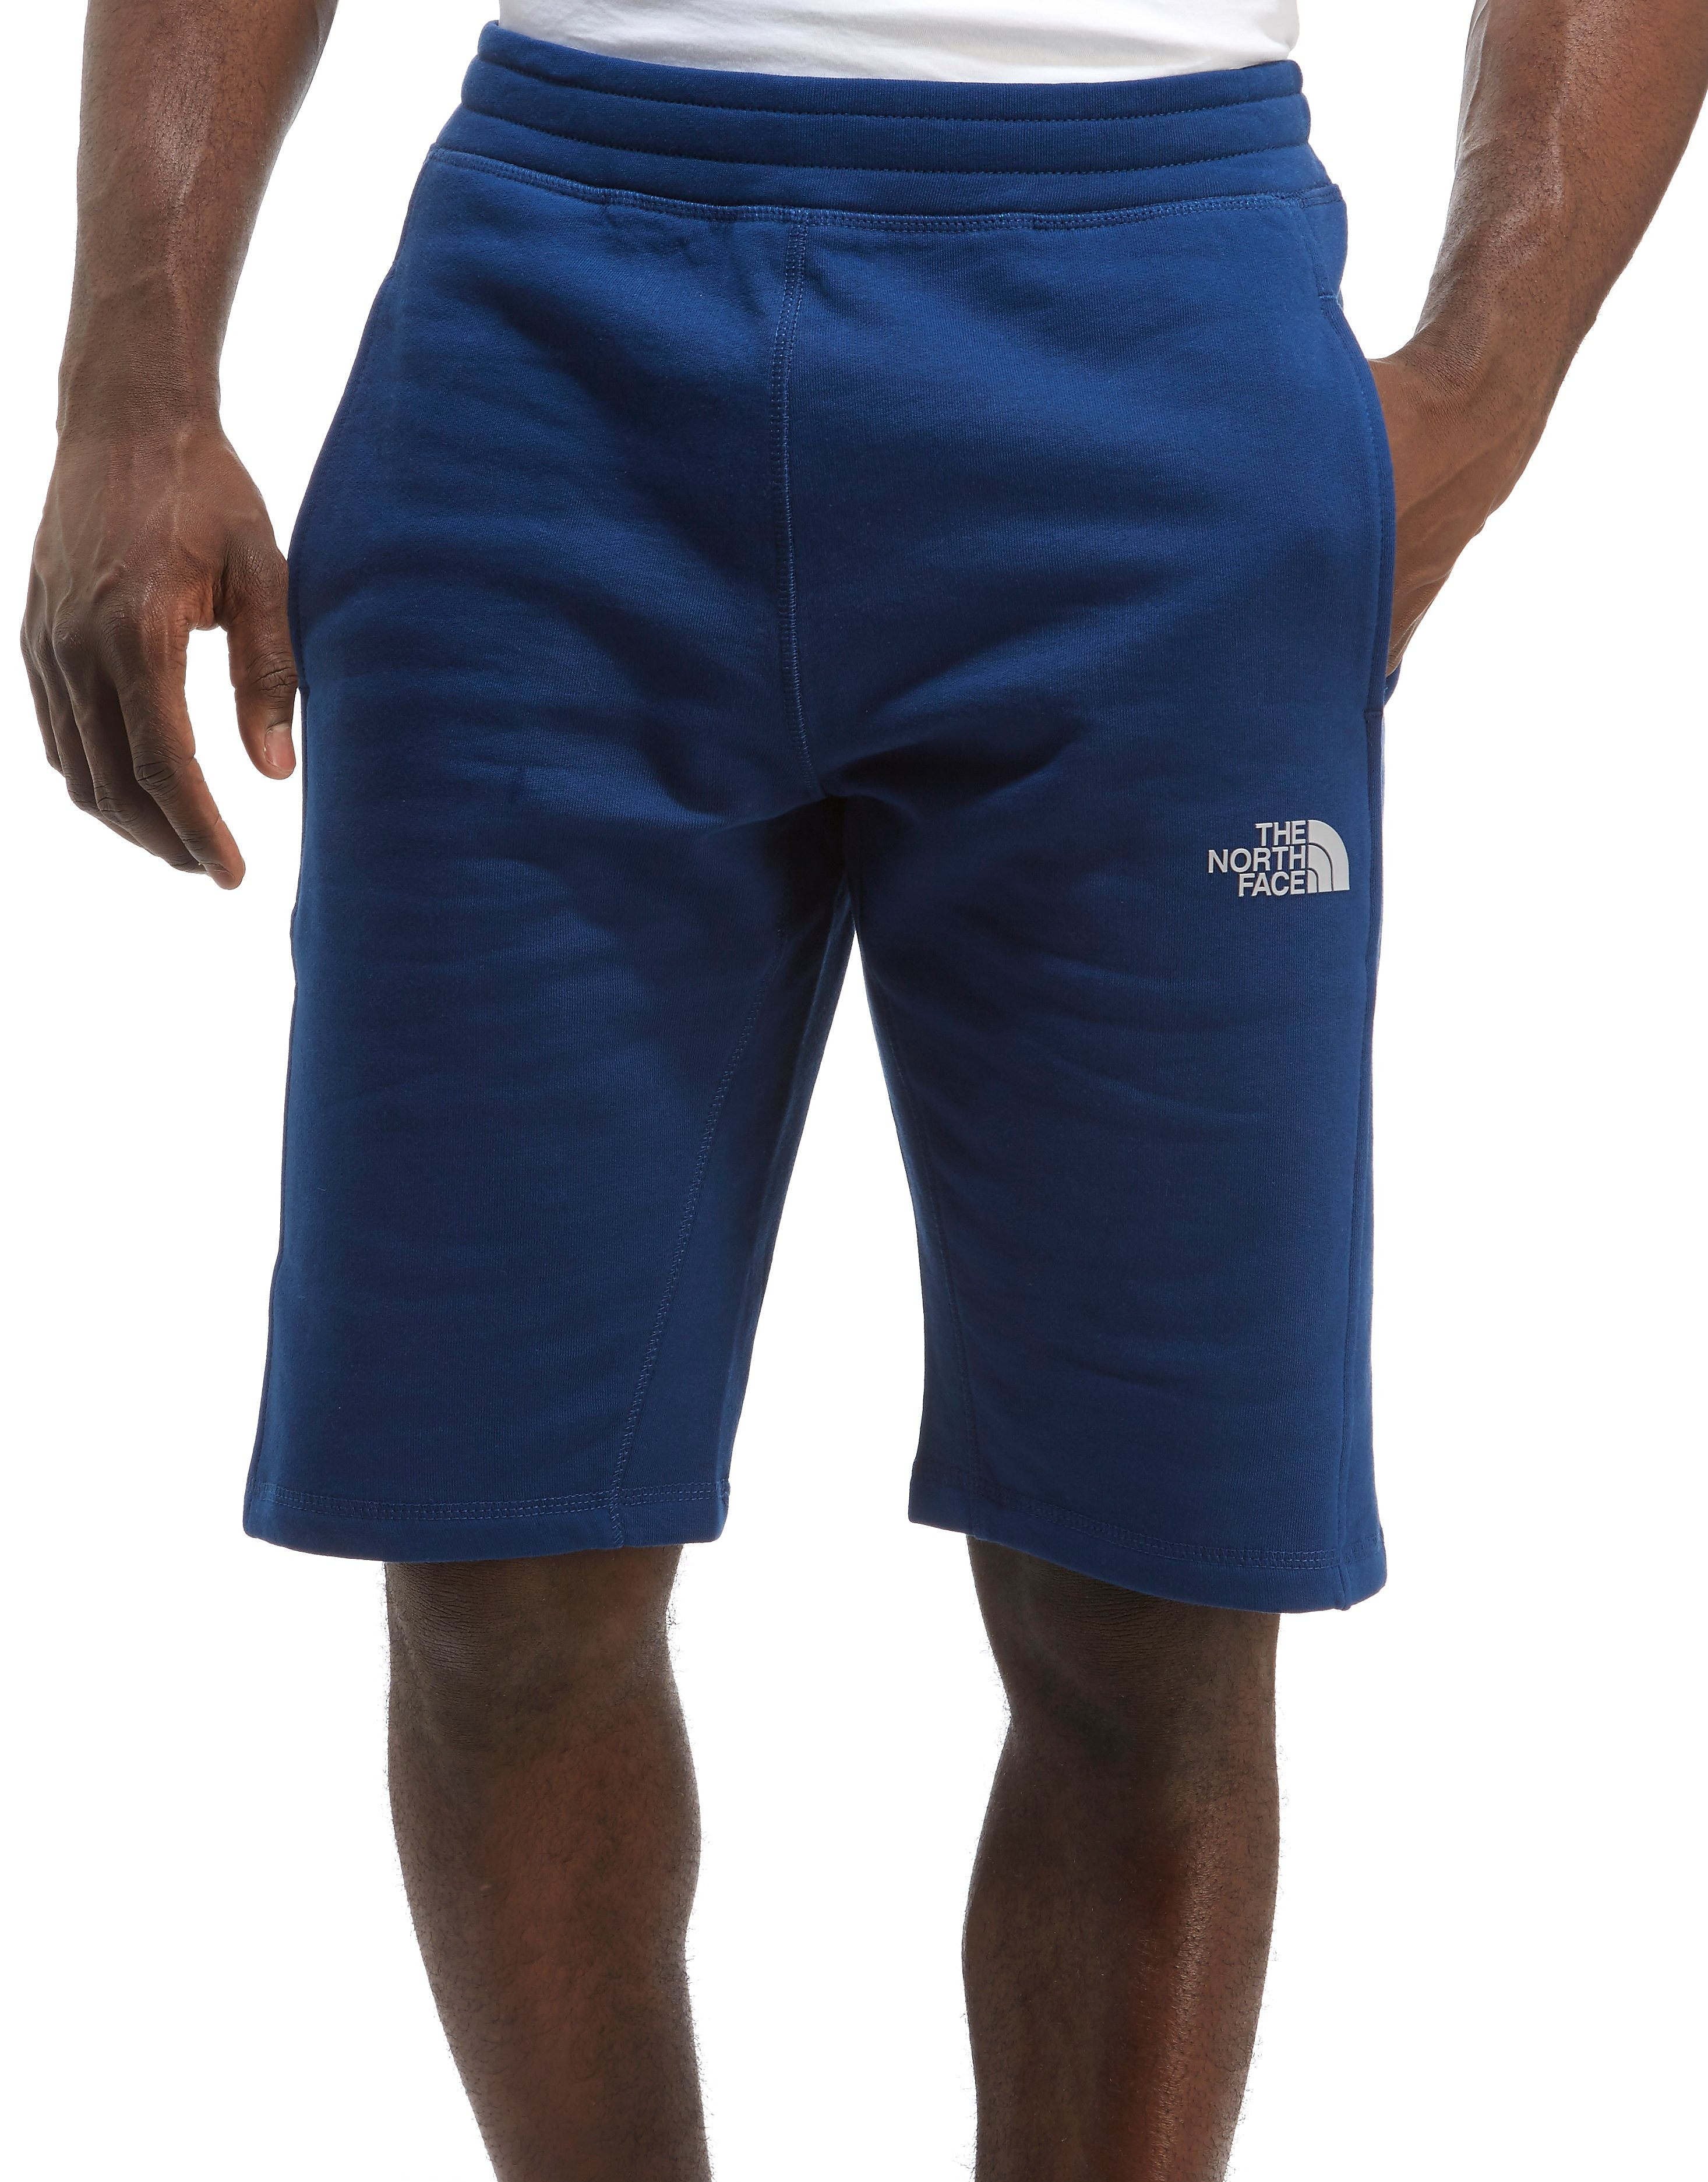 The North Face Bondi Fleece Shorts